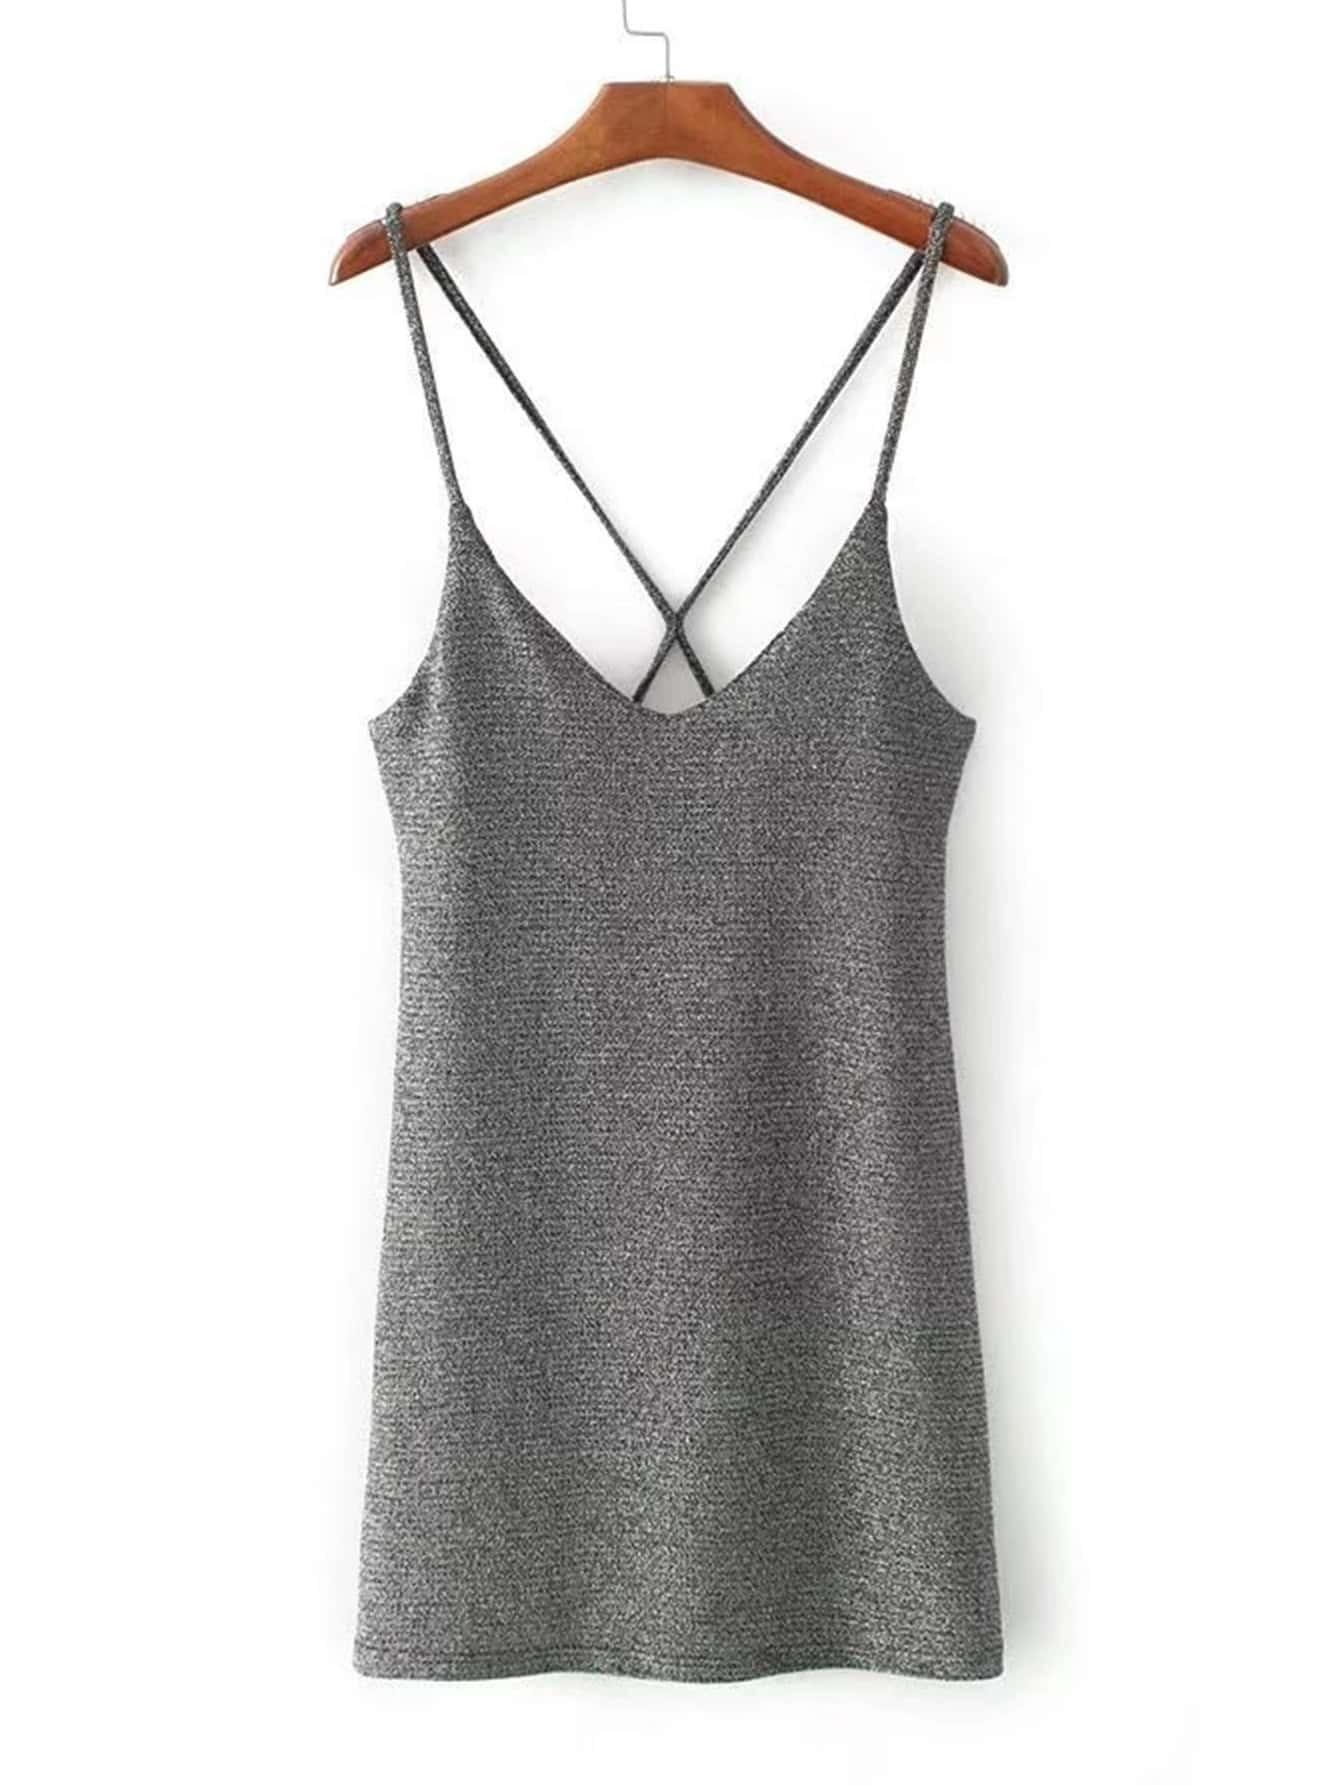 Cross Back Cami Dress rdre170926201